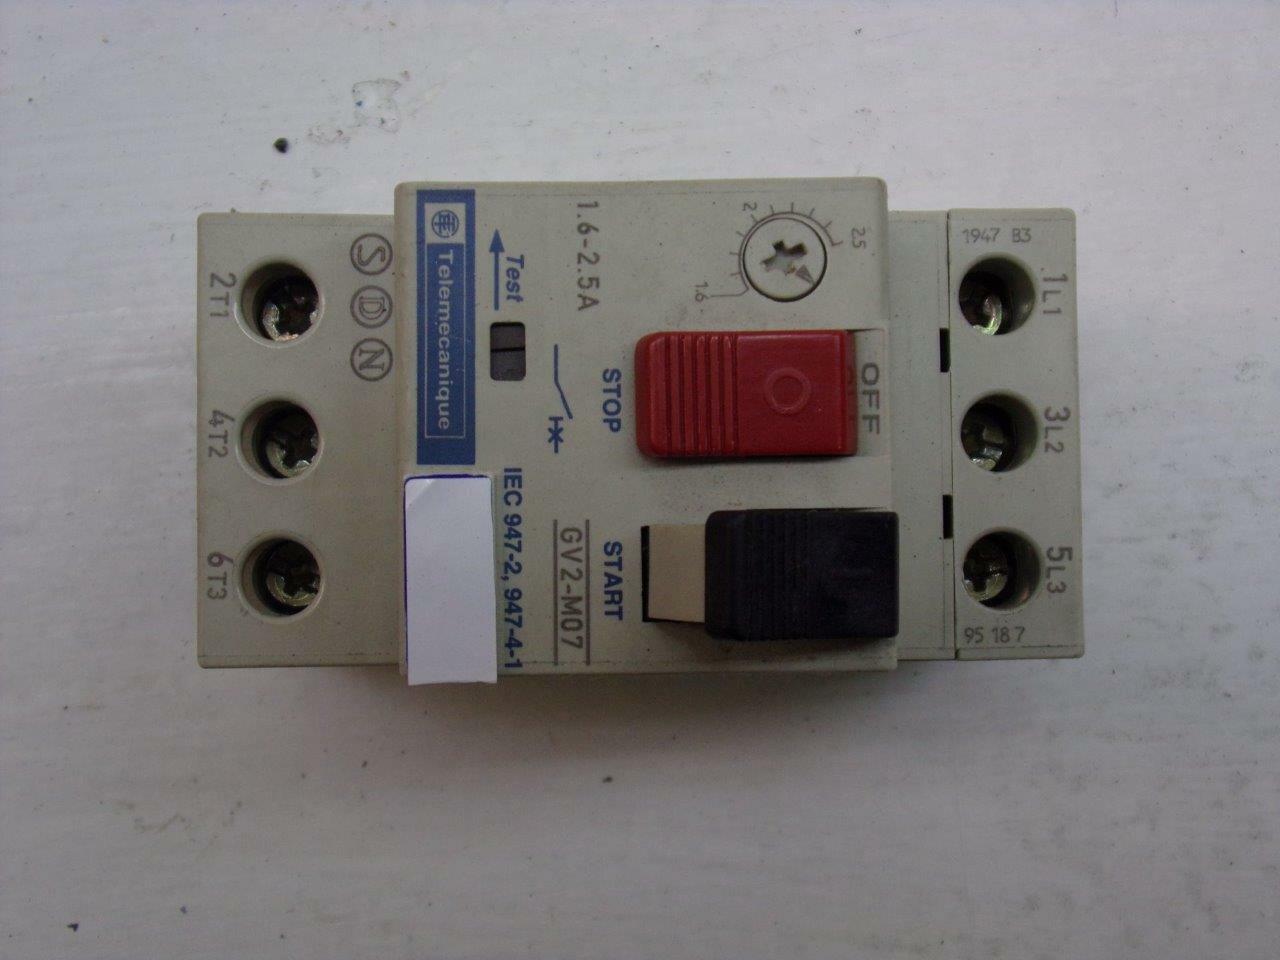 Telemecanique GV2M07 Industrial Control System for sale online